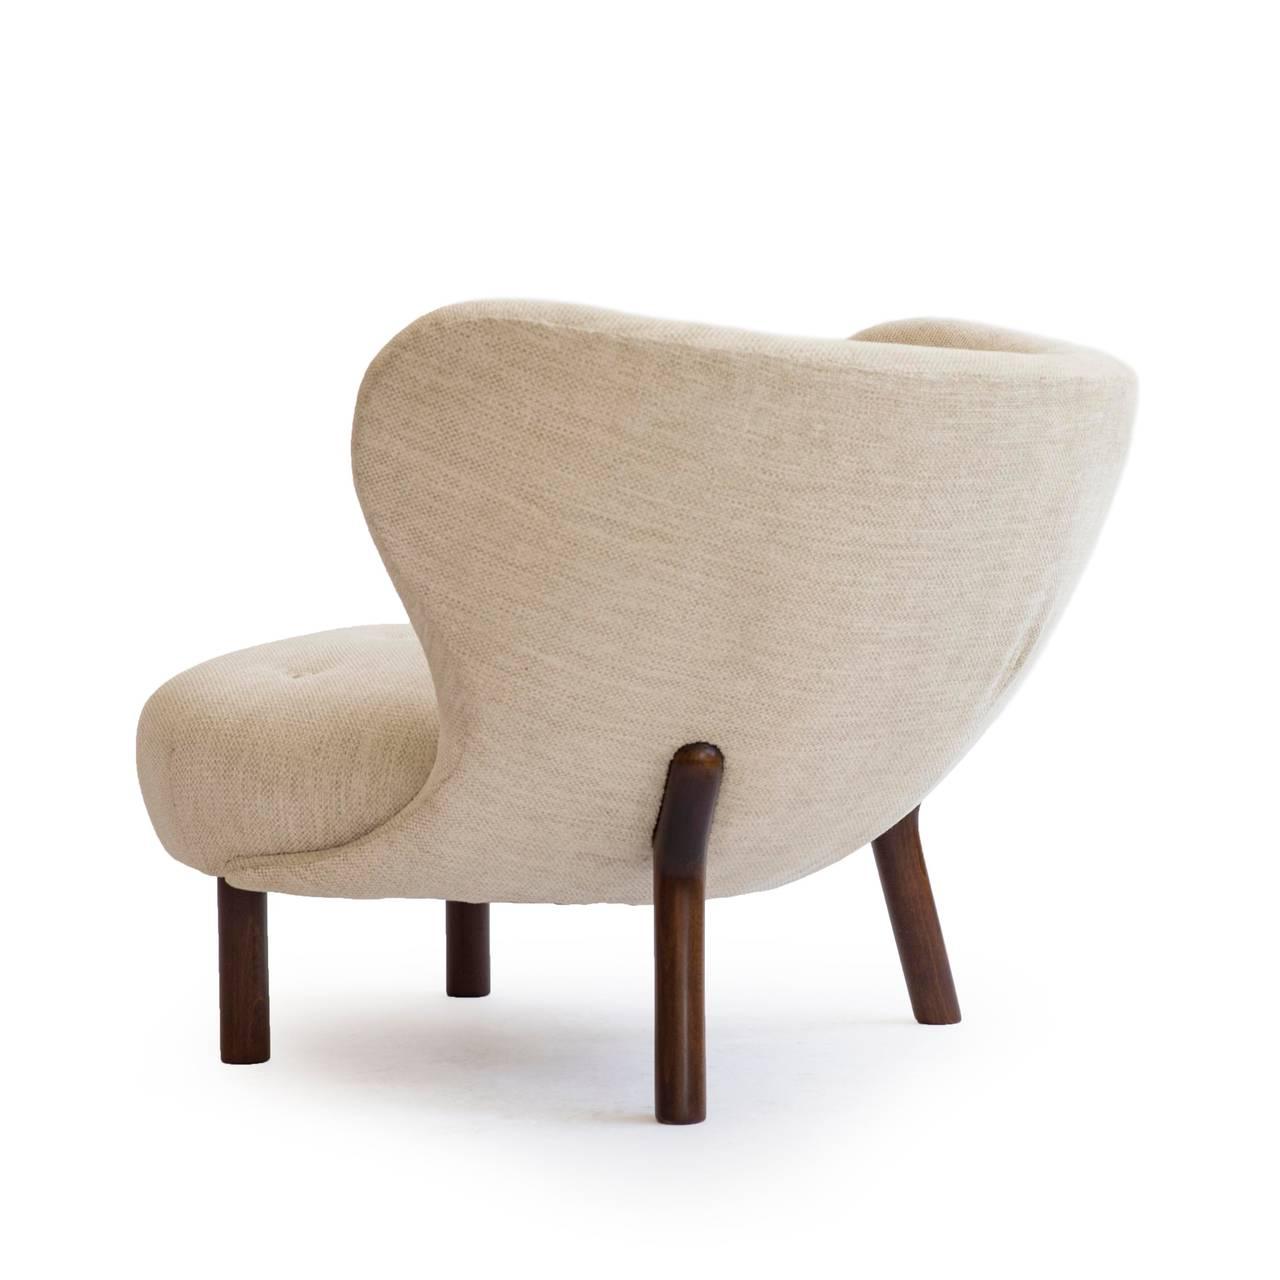 Viggo Boesen Lounge Chair, U0027The Little Petrau0027 By A. J. Iversen 3